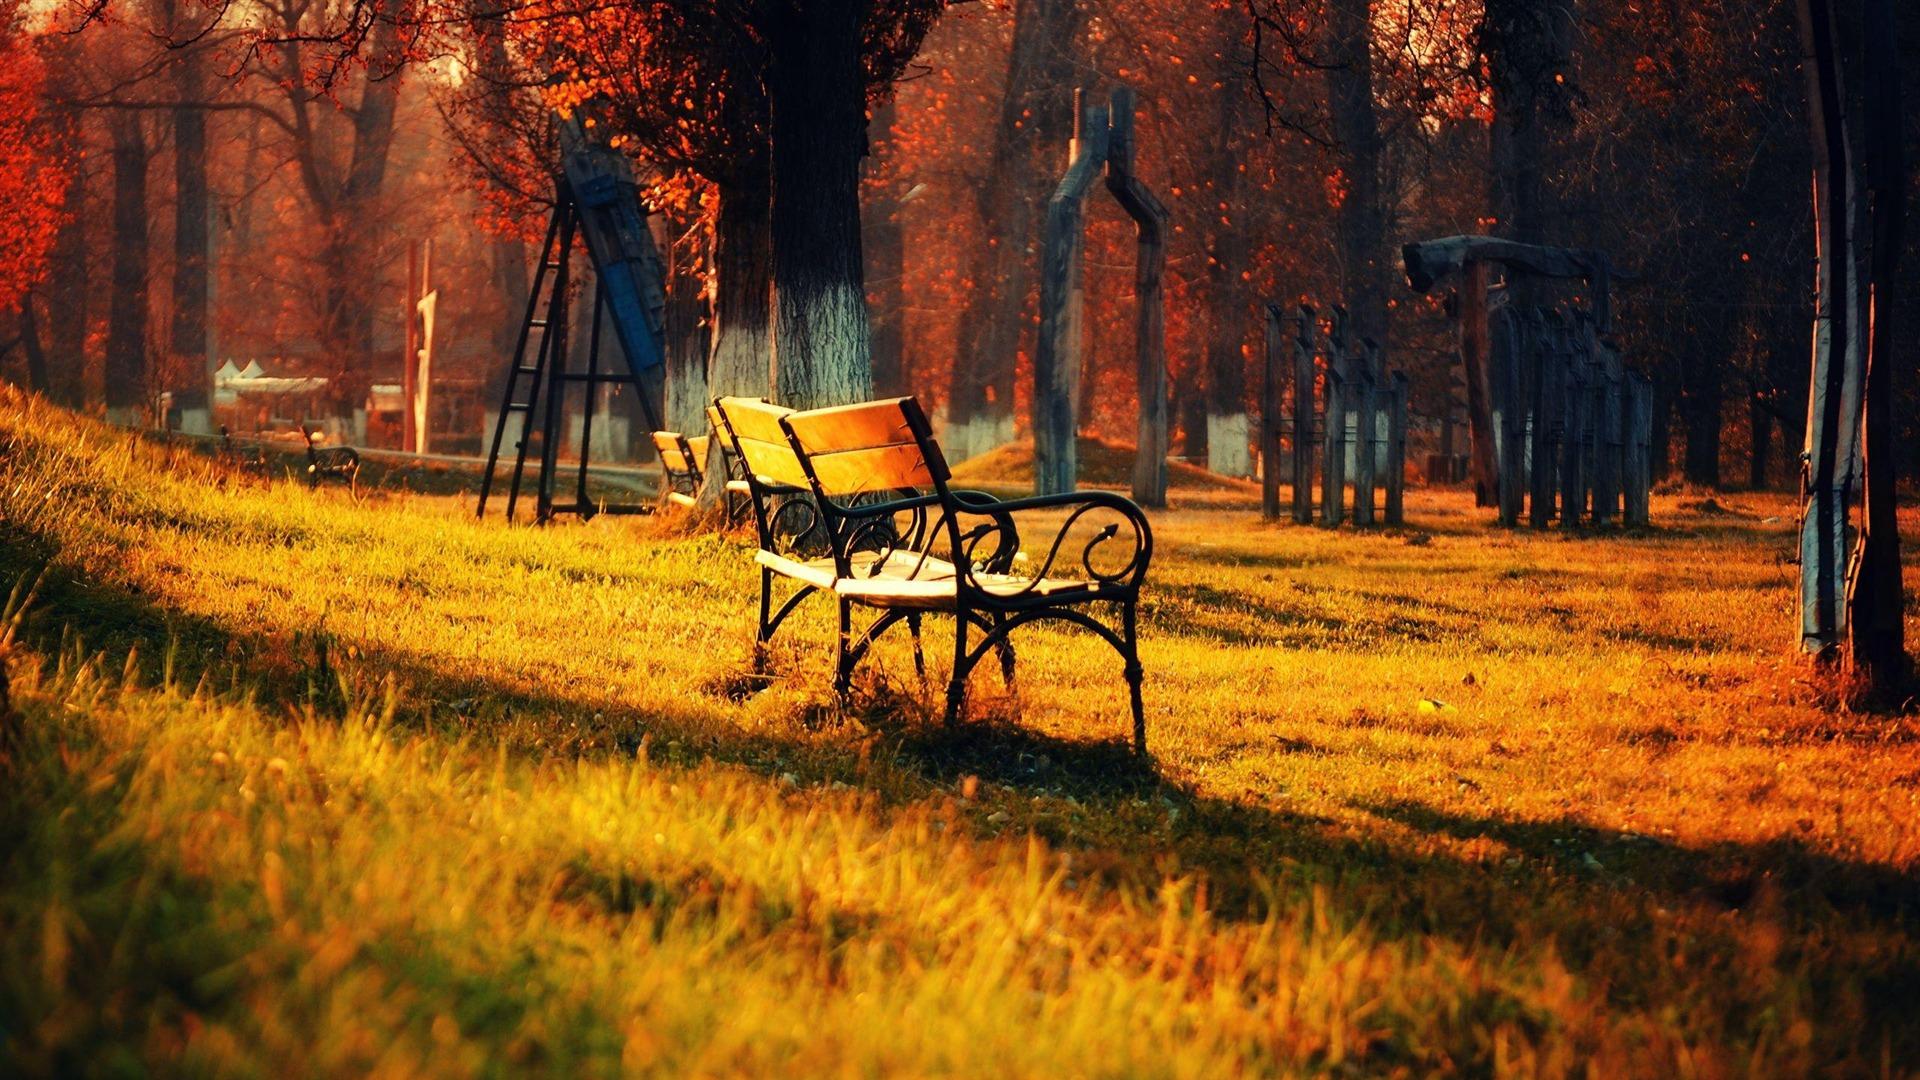 Autumn HD Widescreen Wallpaper - WallpaperSafari